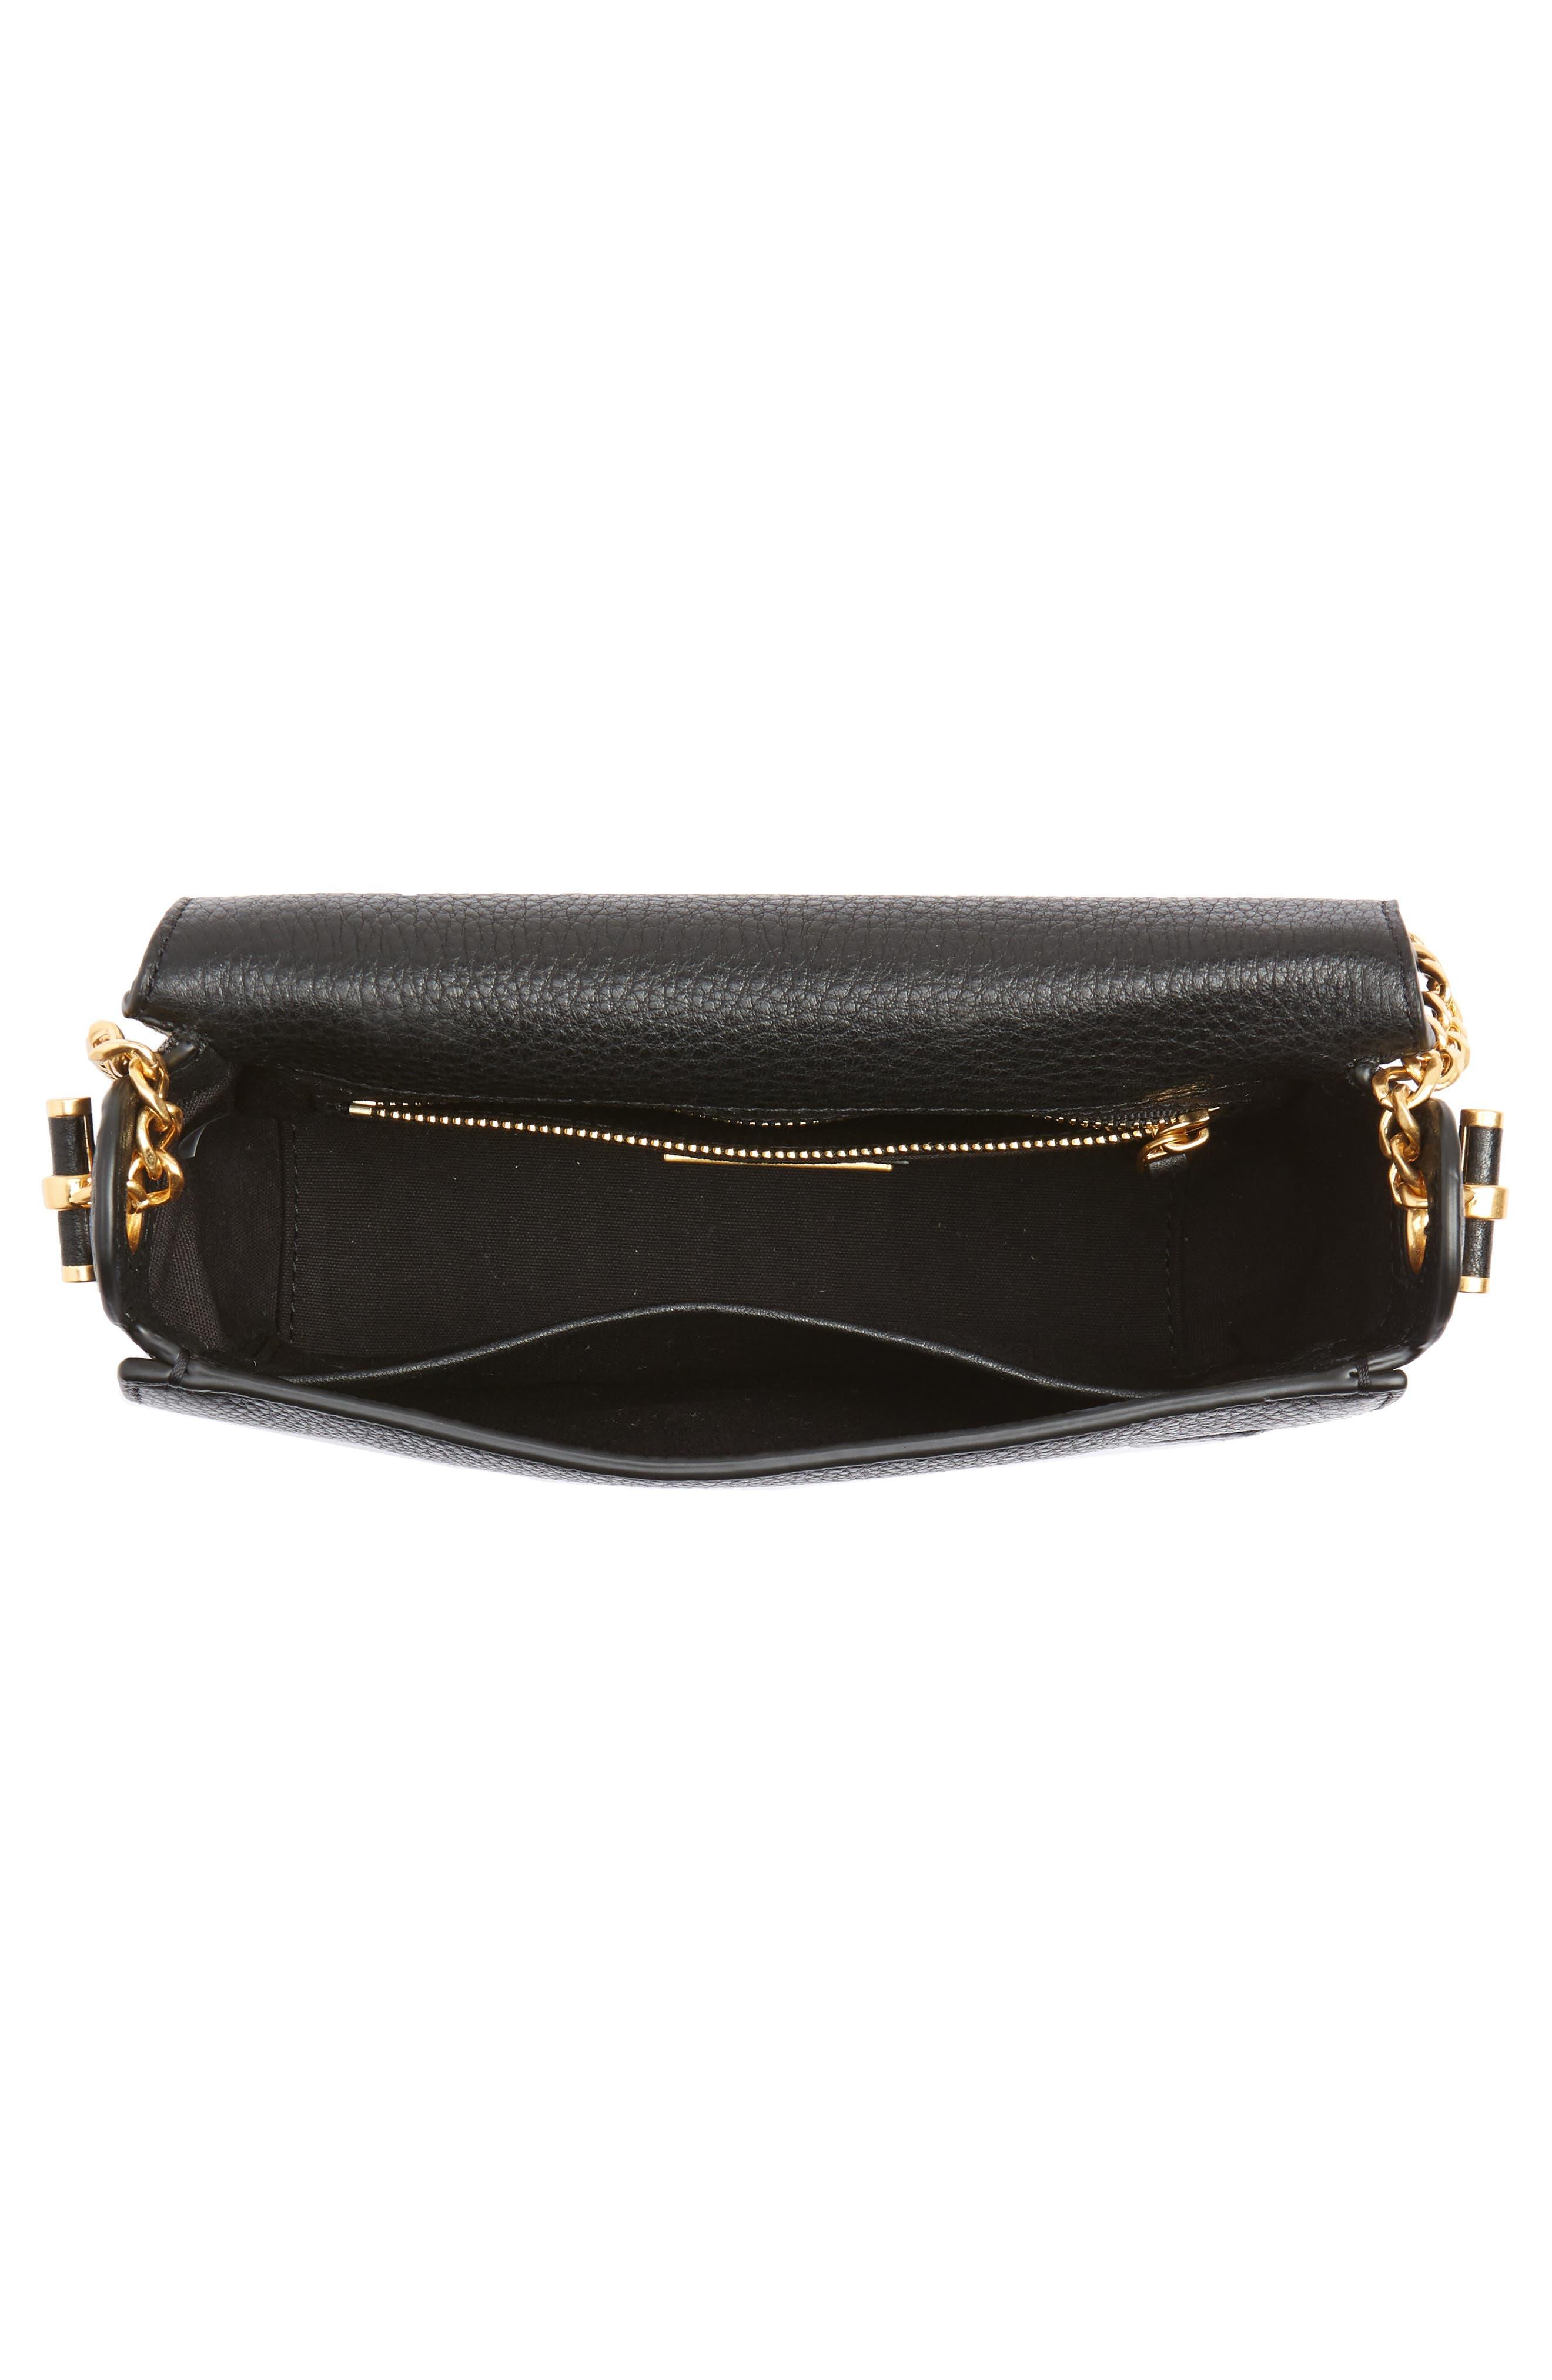 Chelsea Leather Crossbody Bag,                             Alternate thumbnail 4, color,                             BLACK CORE